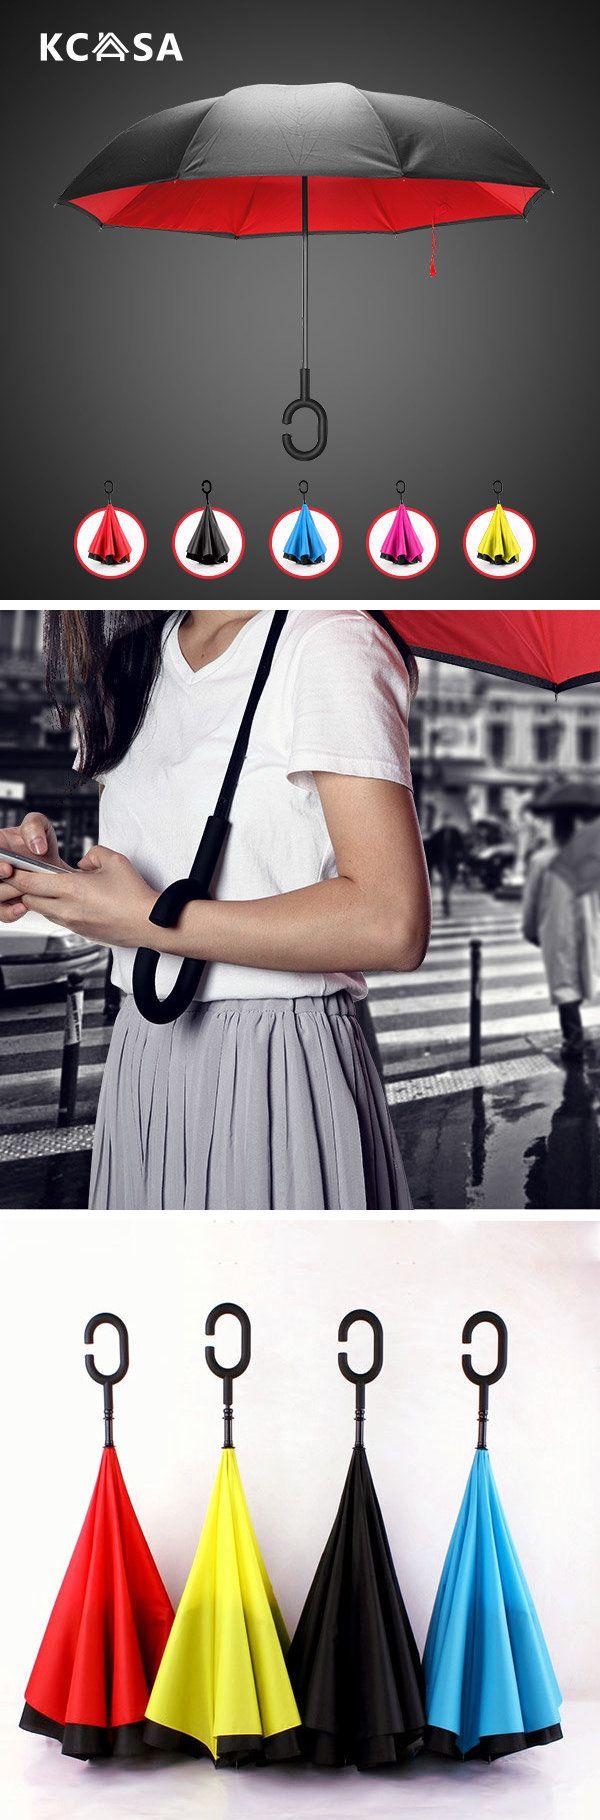 KCASA UB-1 Creative Reverse Double Layer Foldable Umbrella Damp Proof wind Resistant Standing Folding #rain